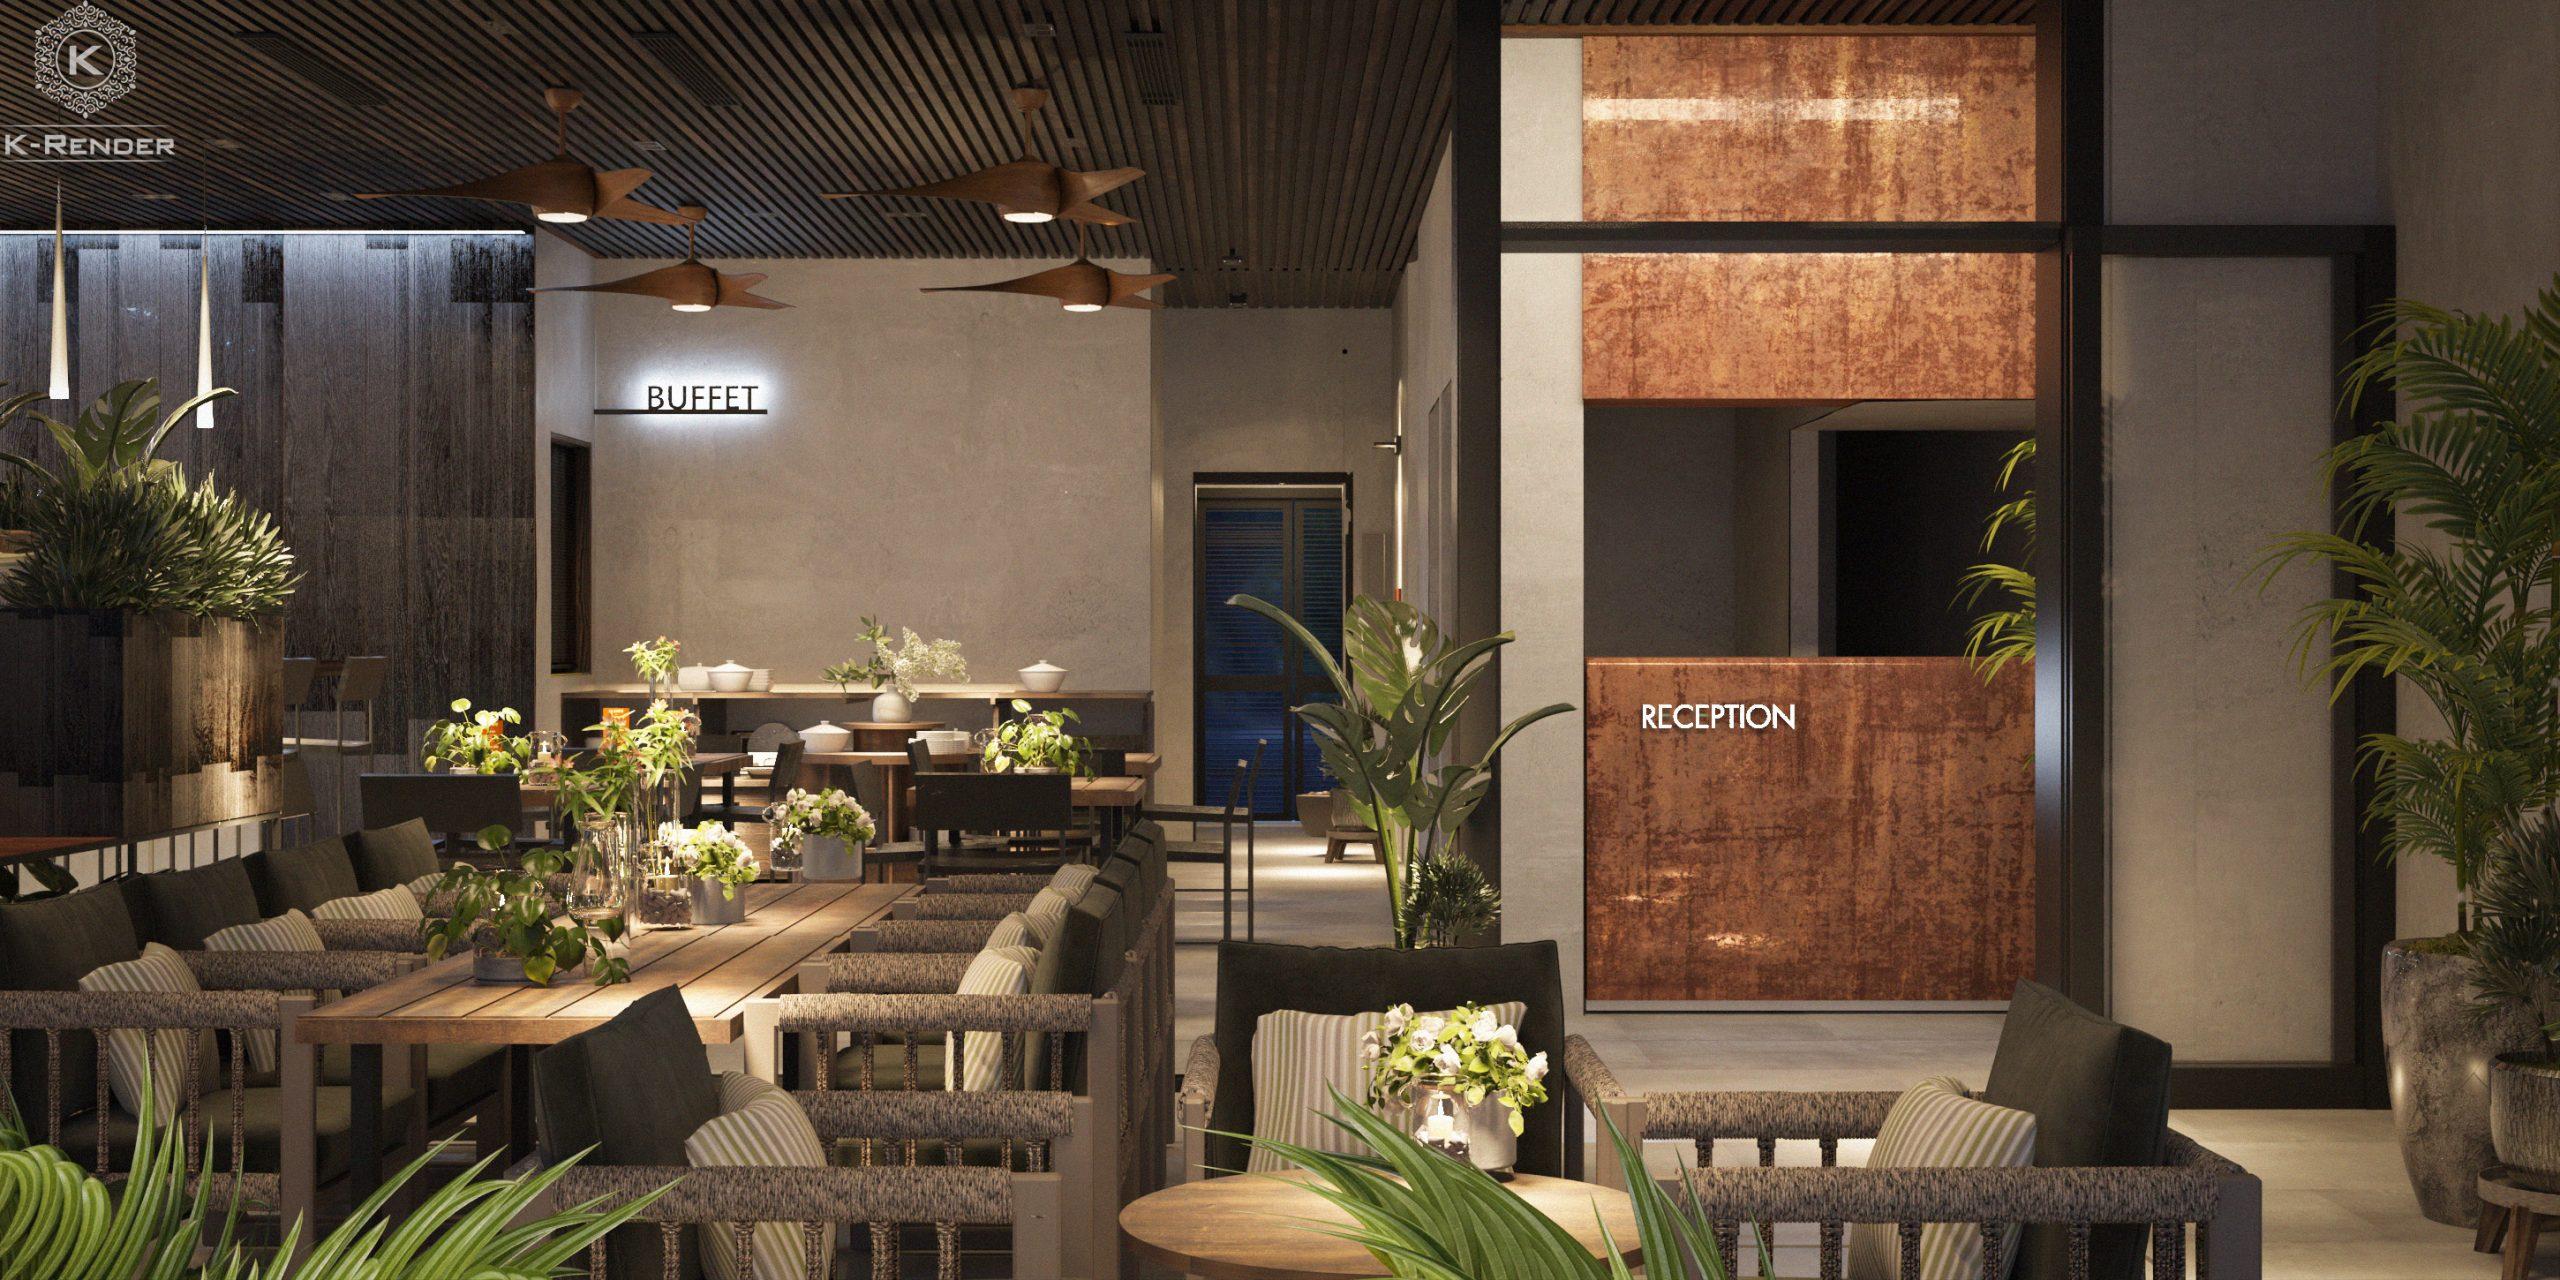 the-summer-bar-and-restaurant-project-k-render-studio-24